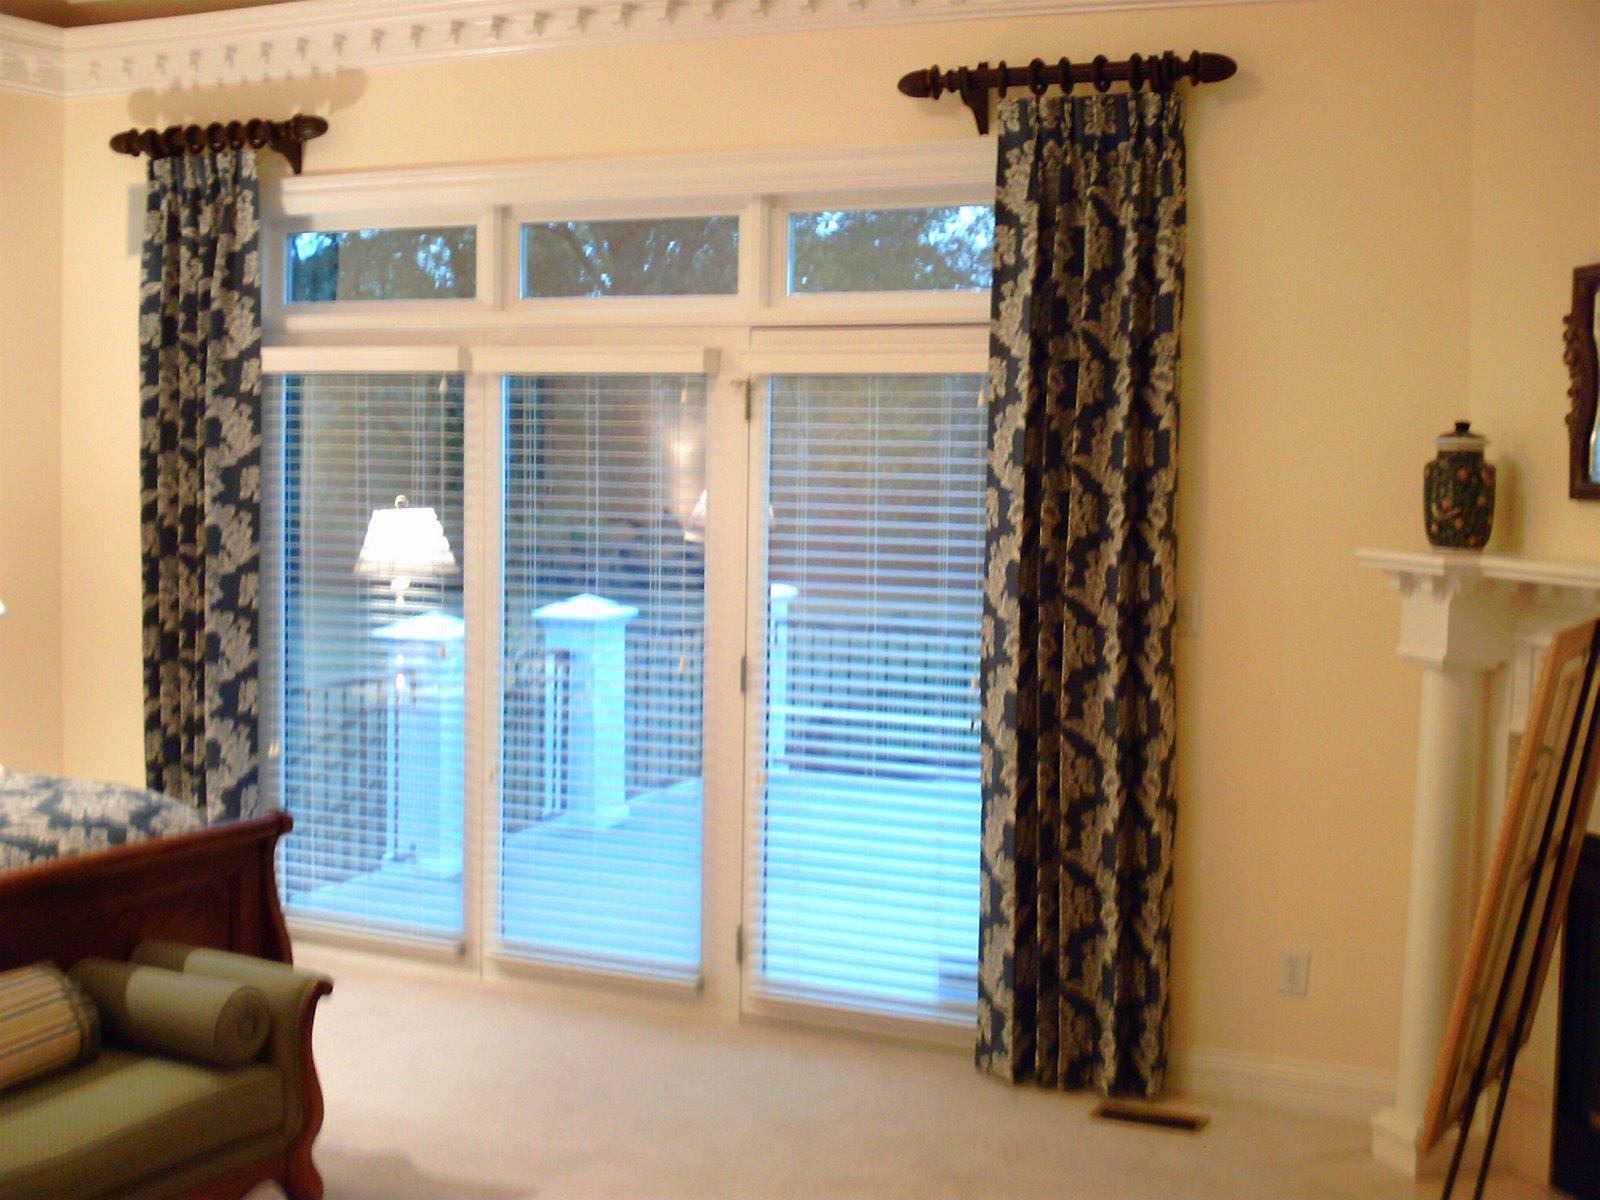 Short curtain rods for side panels - Short Curtain Rods For Side Panels 7